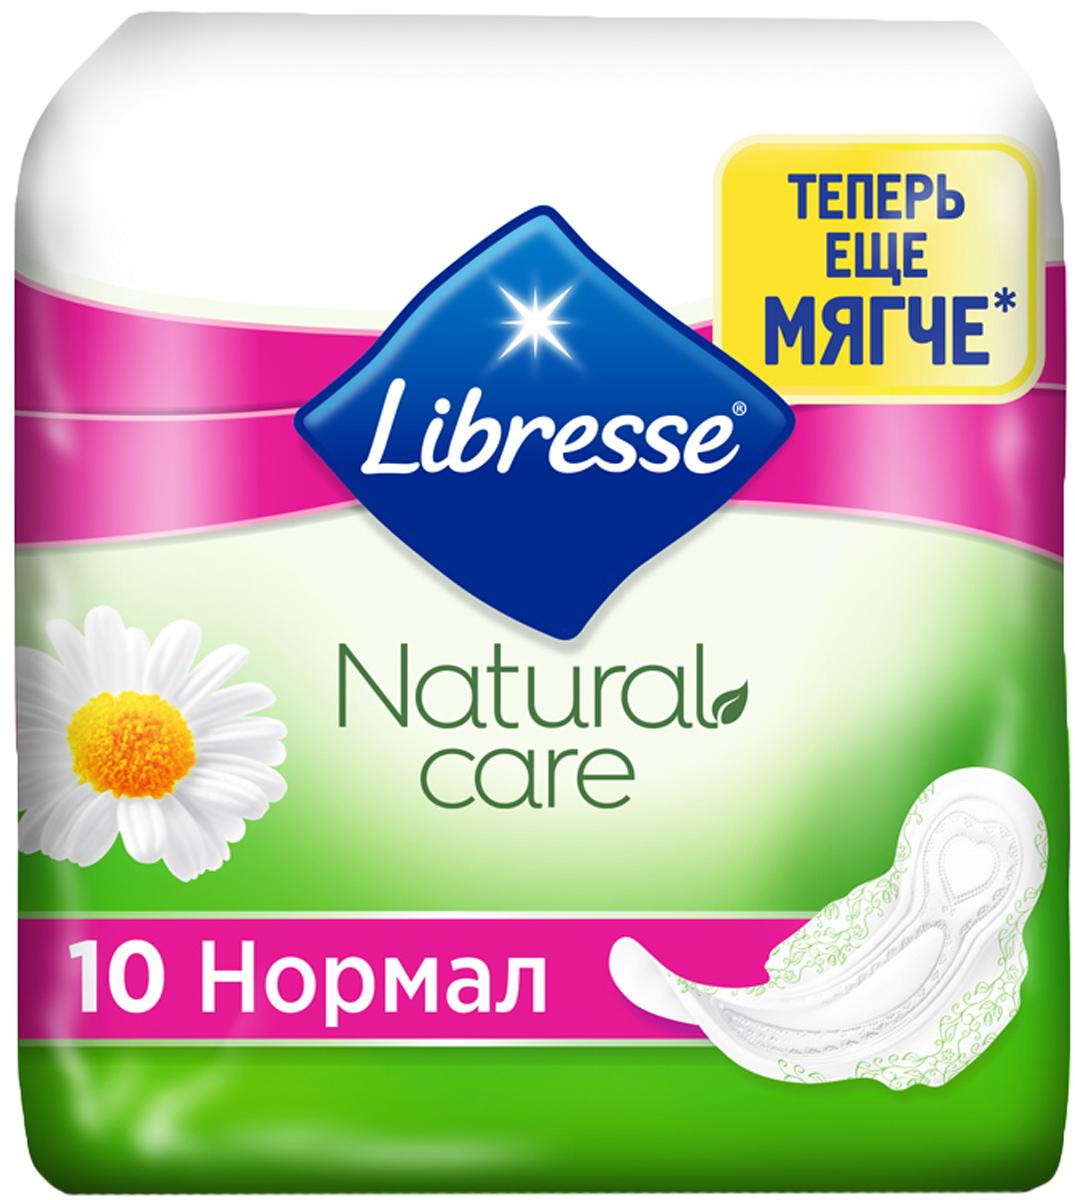 Libresse Гигиенические прокладки Natural Care Ultra Normal,10 шт прокладки libresse дэйлифреш нормал 60шт ежедн